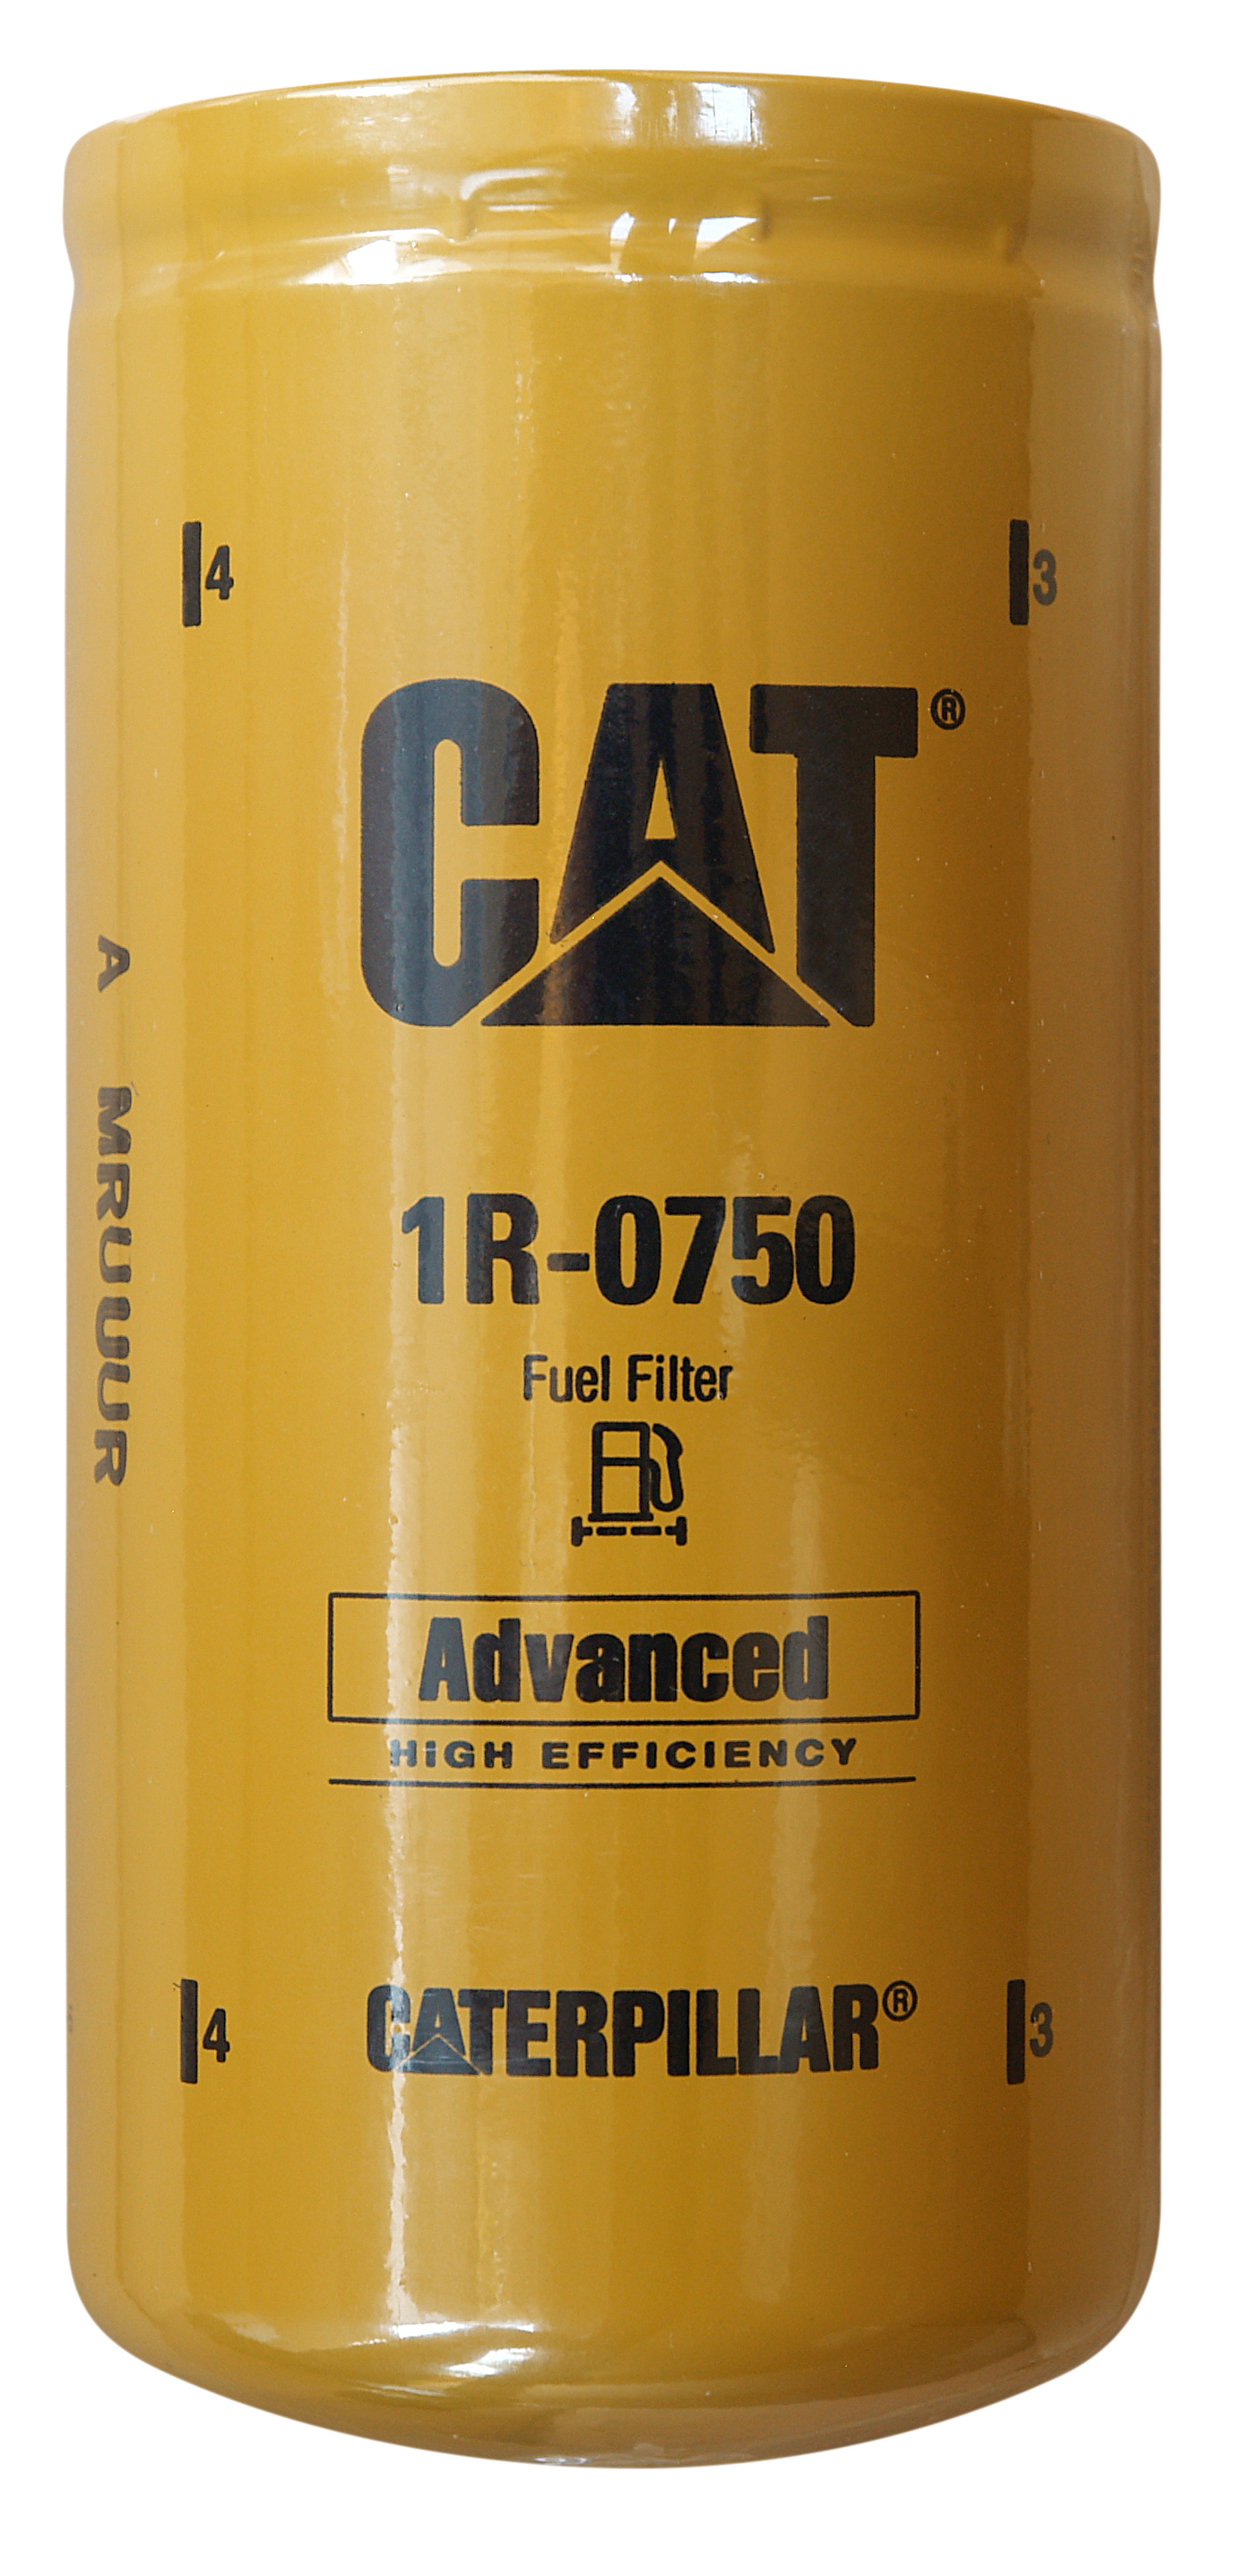 Caterpillar 1r 0750 Advanced High Efficiency Fuel Filter Arnold Filters